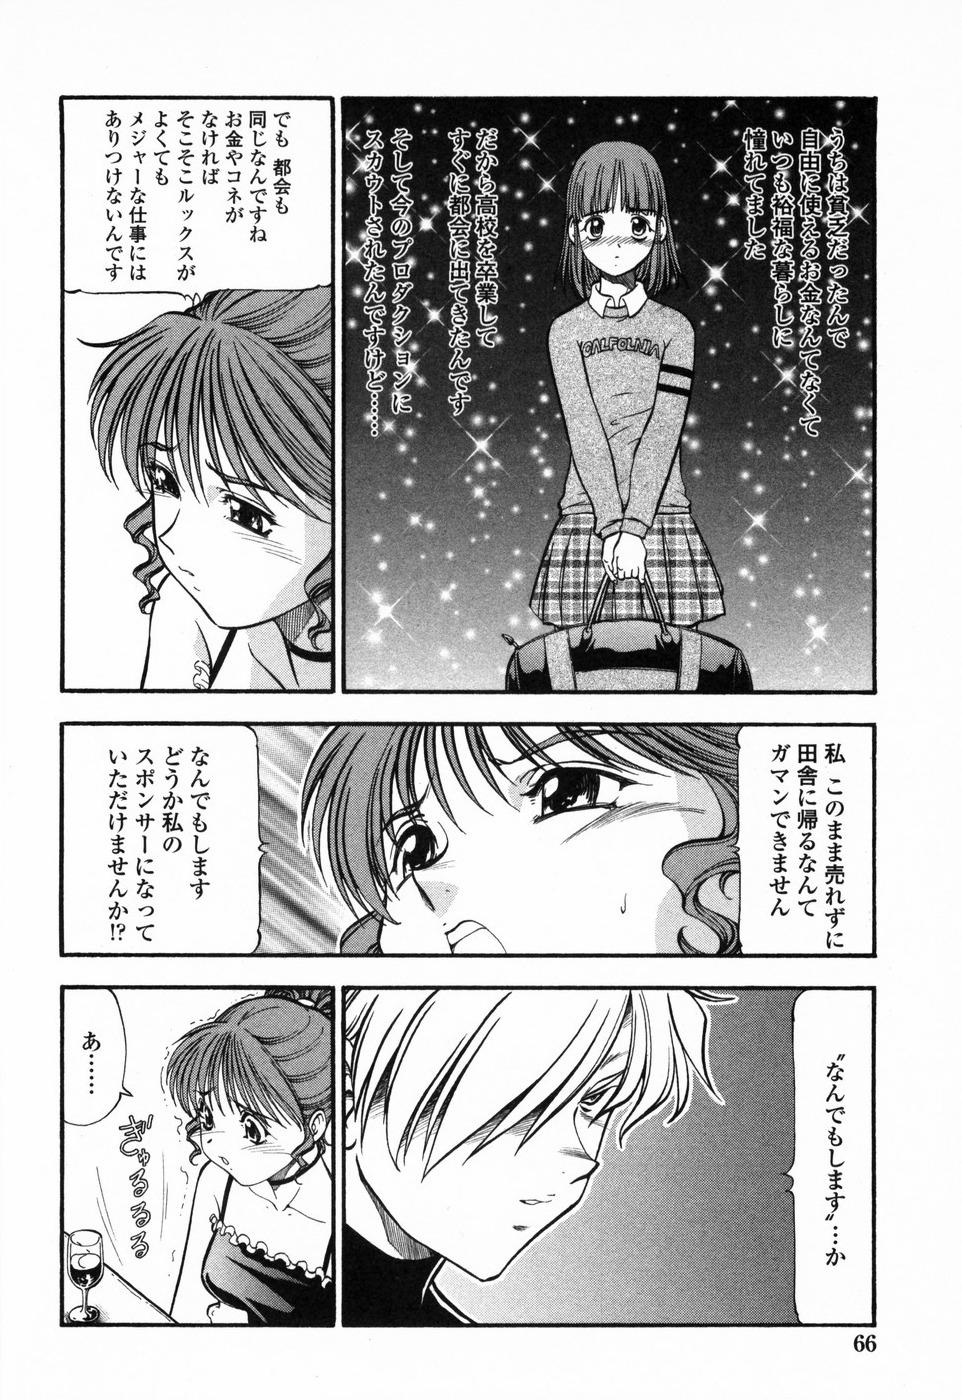 Kichiku Houteishiki - Equation of brutal person 71